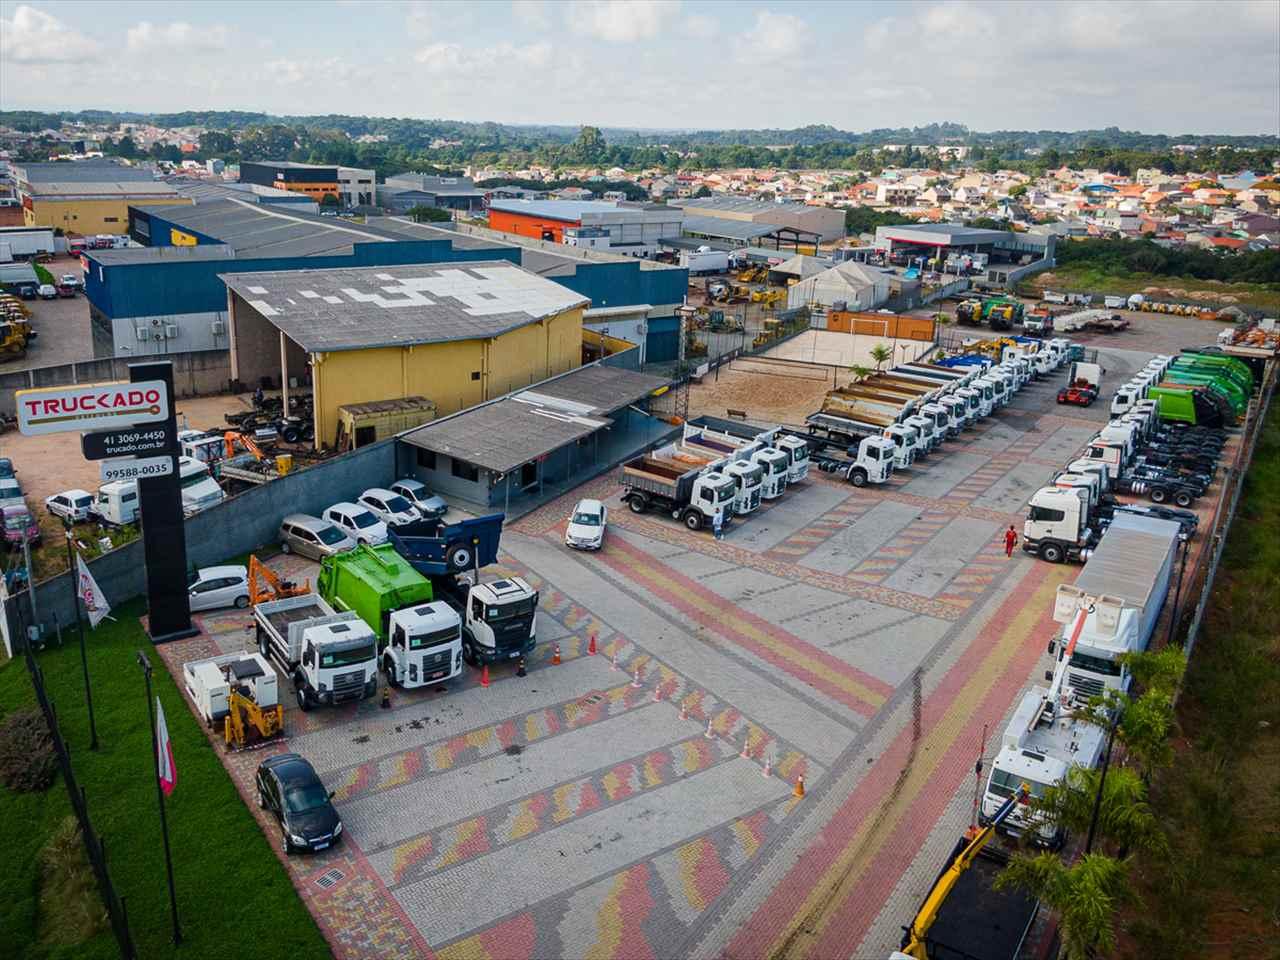 Foto da Loja da Truckado Veículos